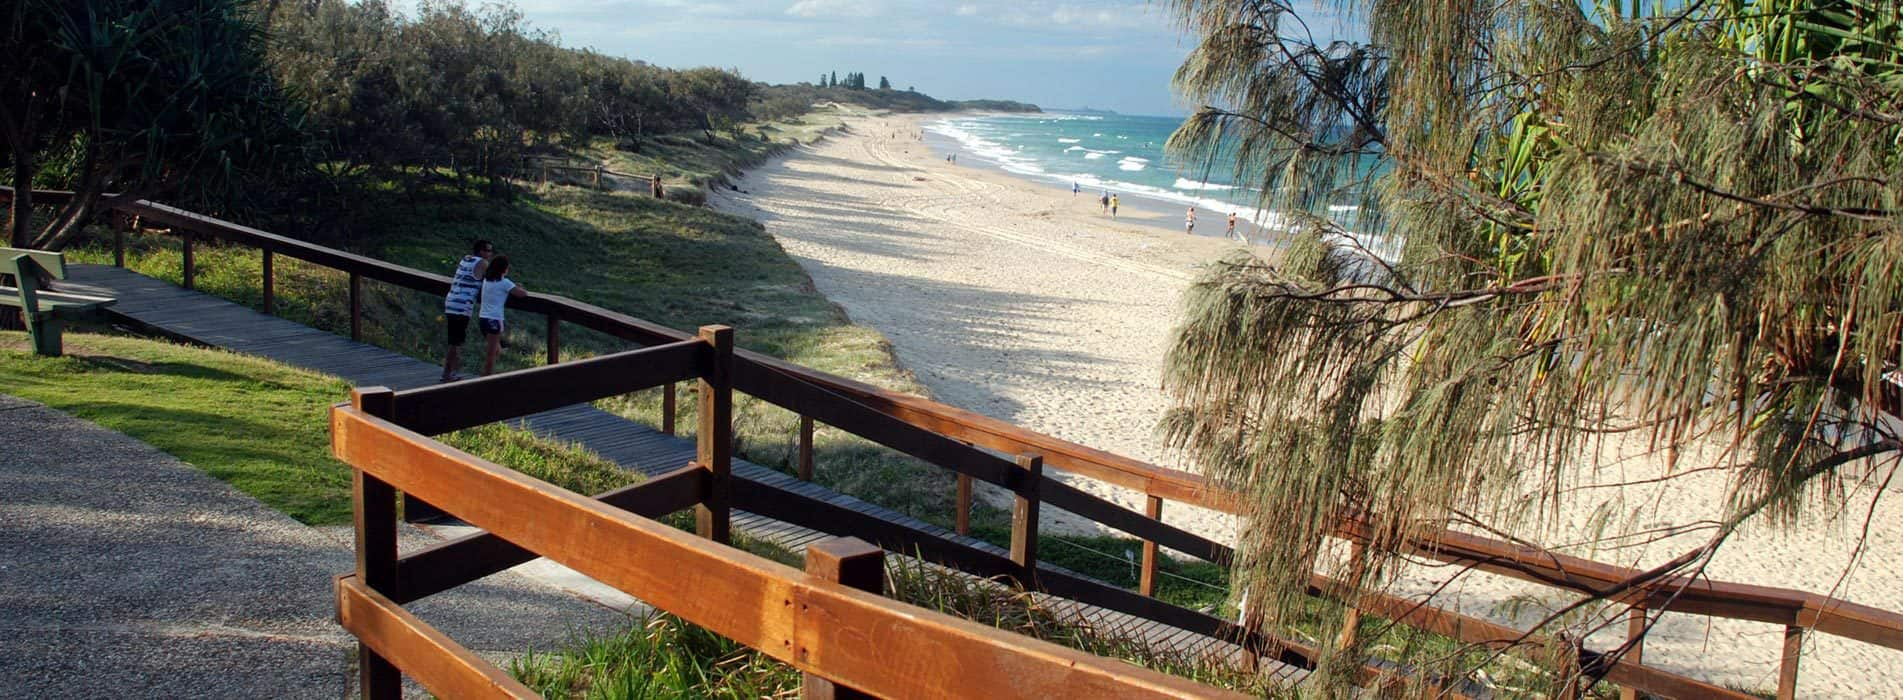 Arrested Graphics at home on Kawana Sunshine Coast Queensland